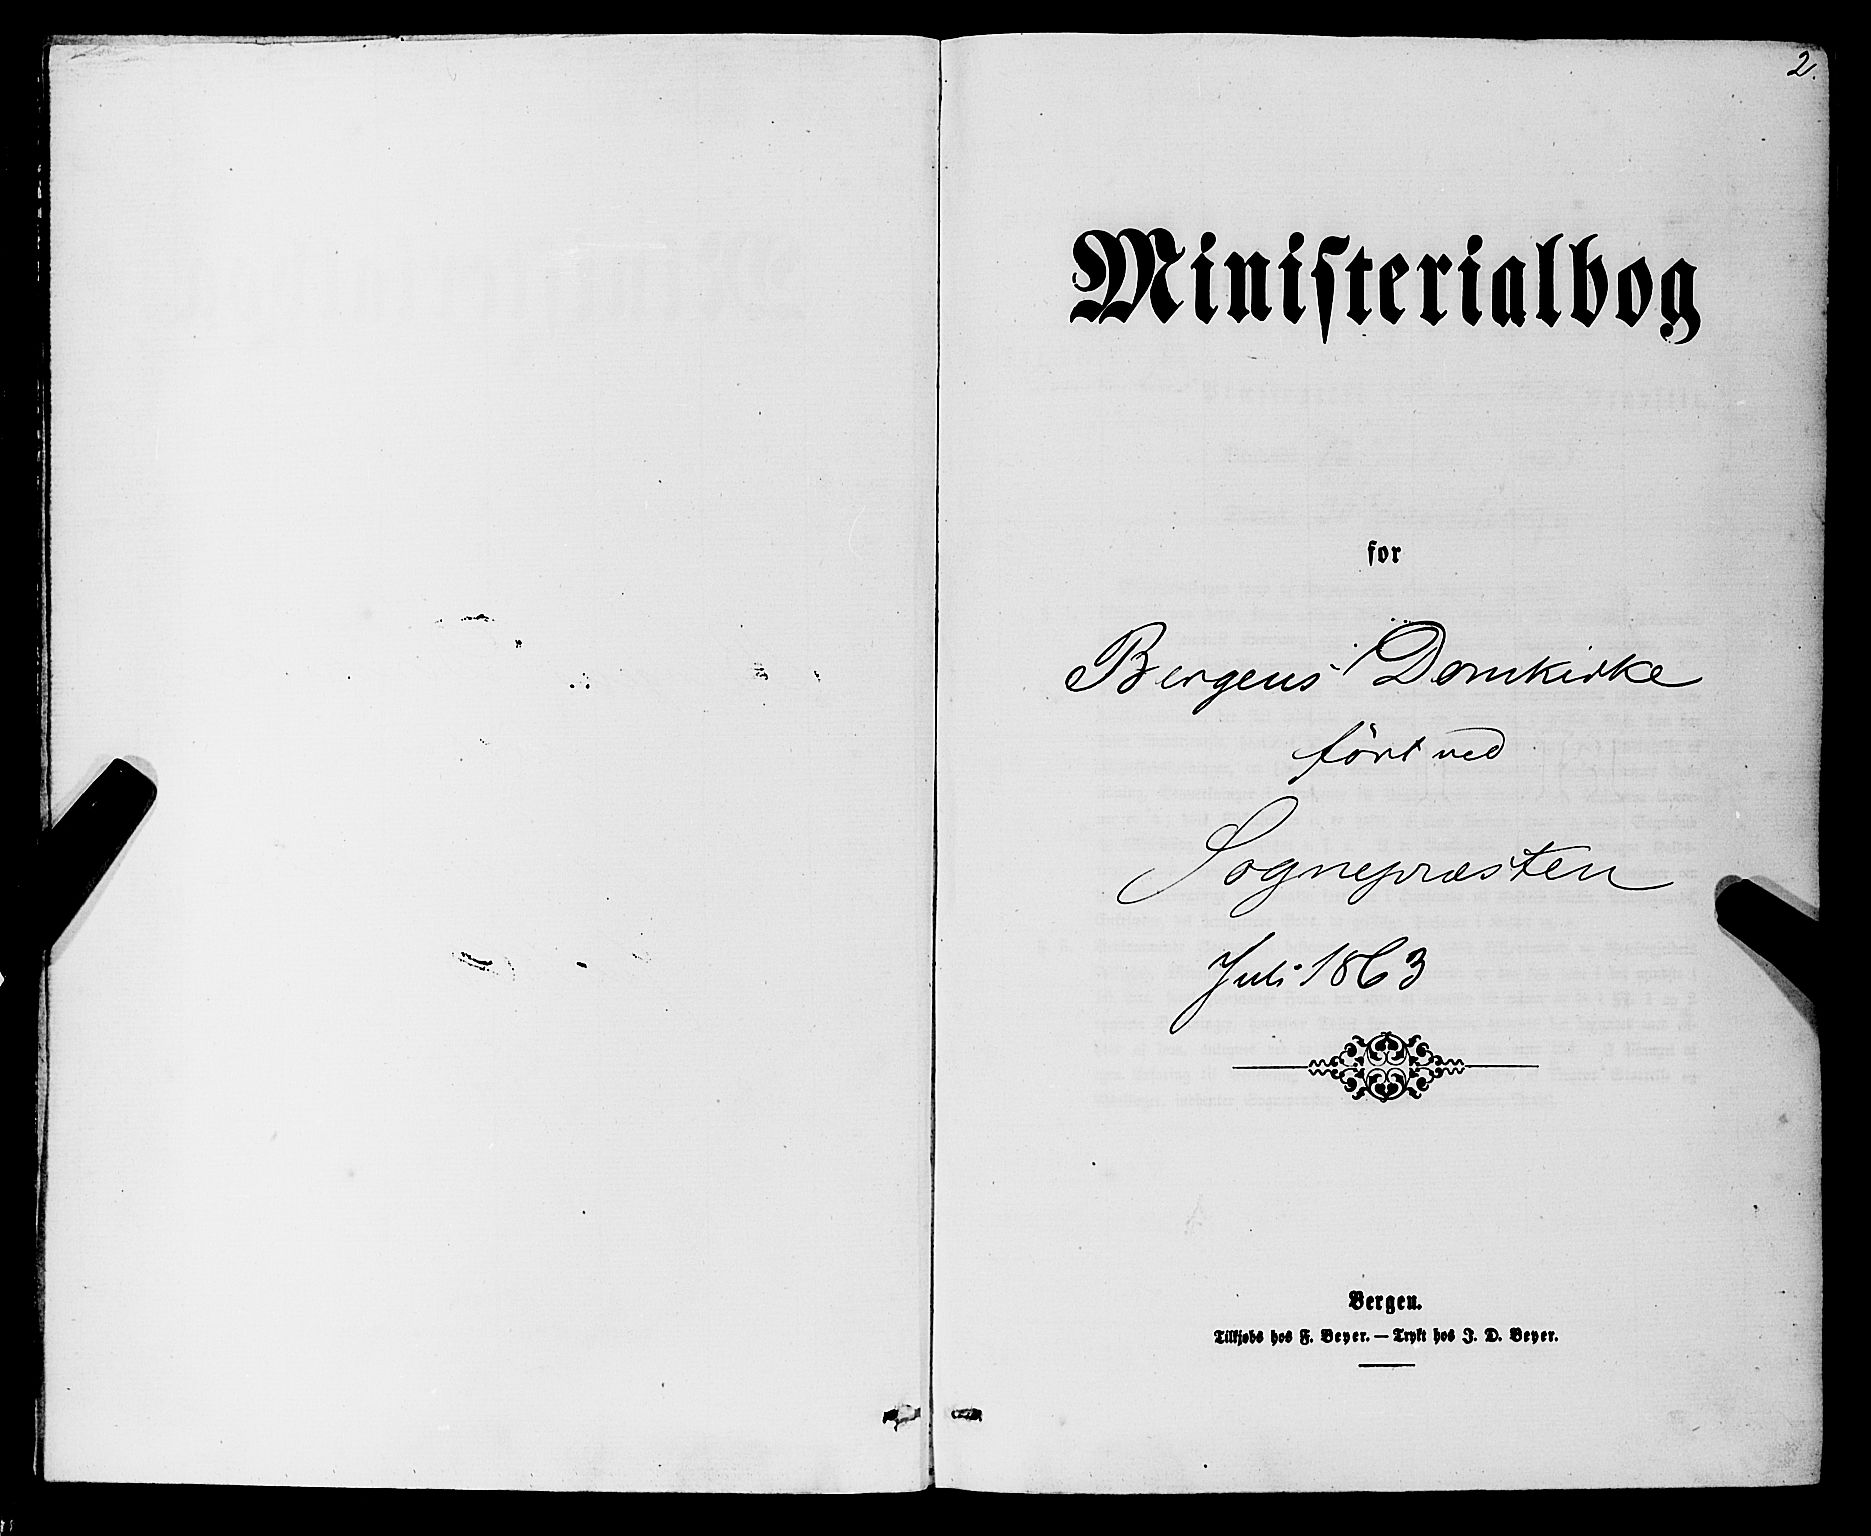 SAB, Domkirken Sokneprestembete, H/Haa/L0042: Ministerialbok nr. E 3, 1863-1876, s. 2